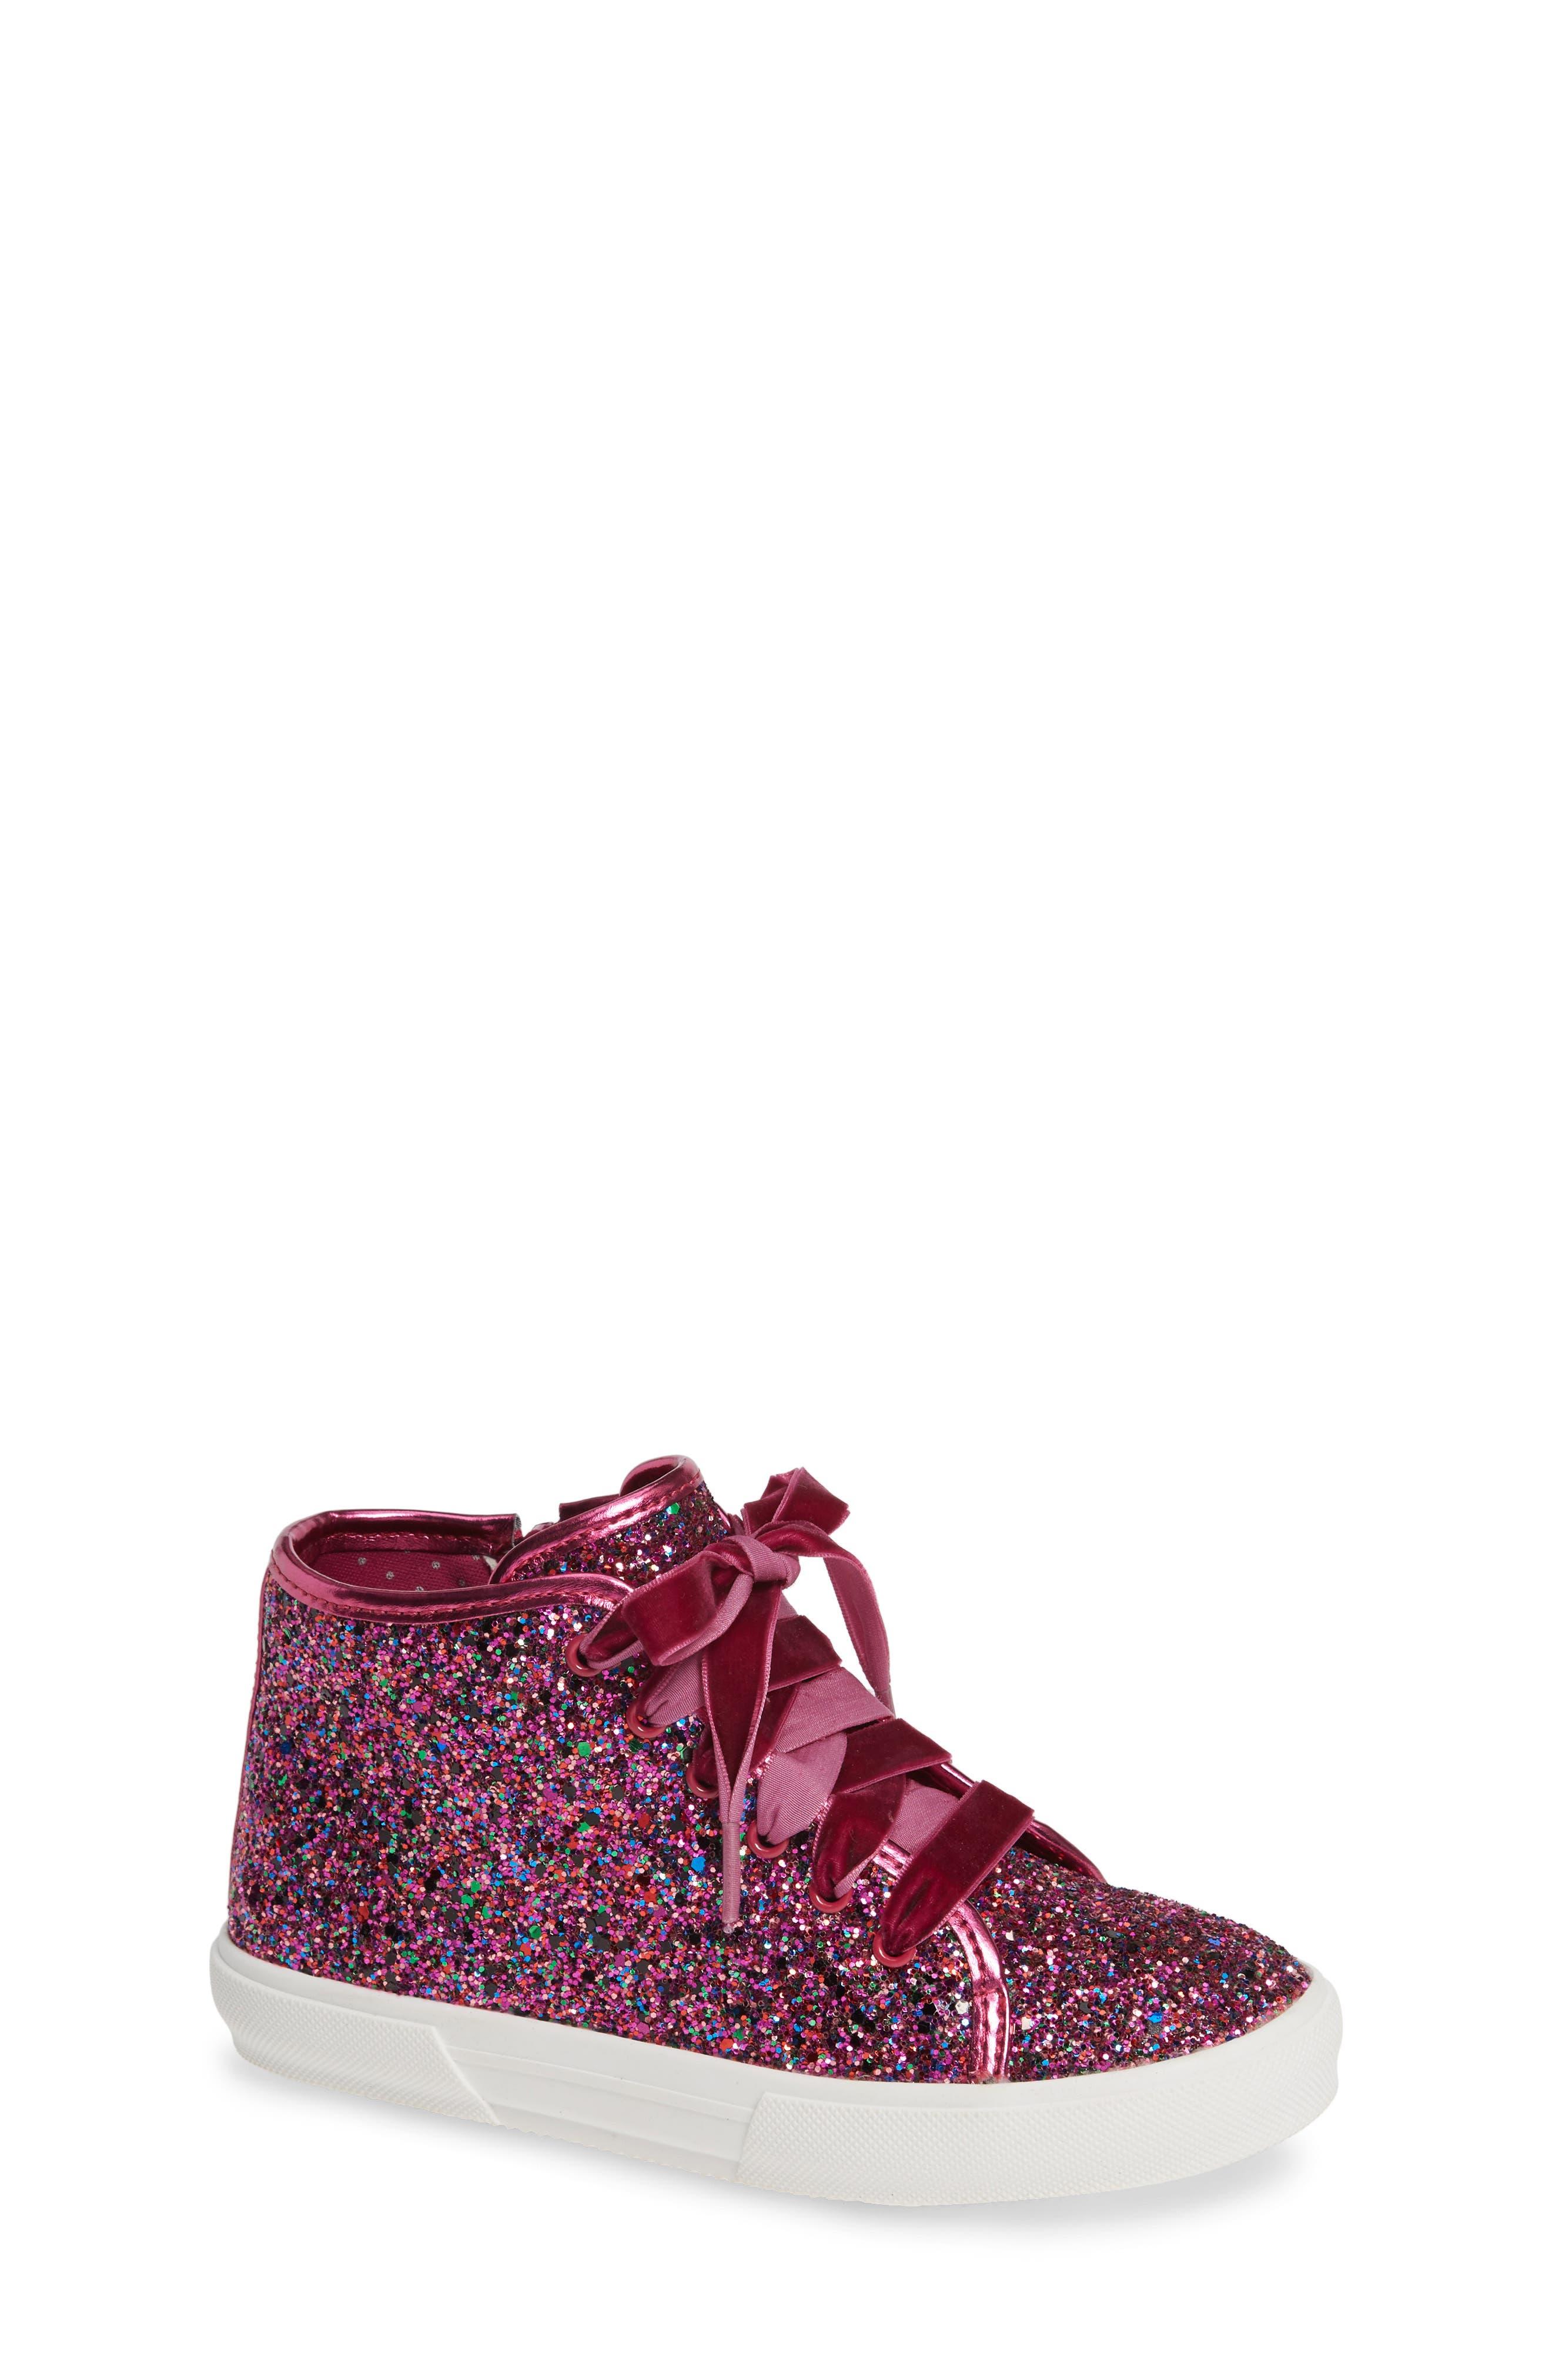 TUCKER + TATE Skylar Glitter Sneaker, Main, color, FUSCHIA MULTI GLITTER PU